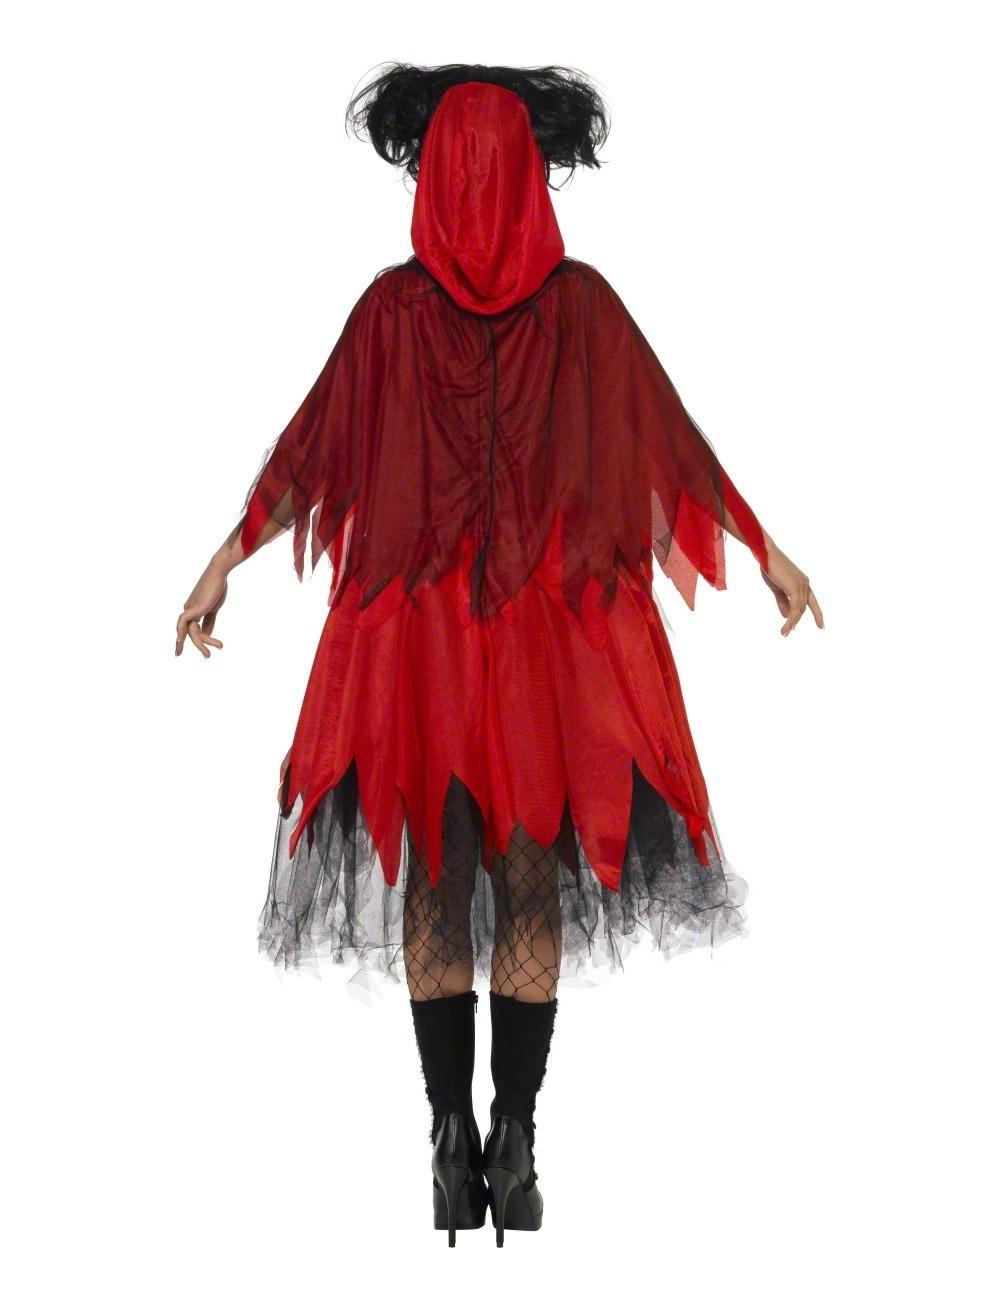 vegaoo karneval fasching kost me zubeh r riesen auswahl. Black Bedroom Furniture Sets. Home Design Ideas